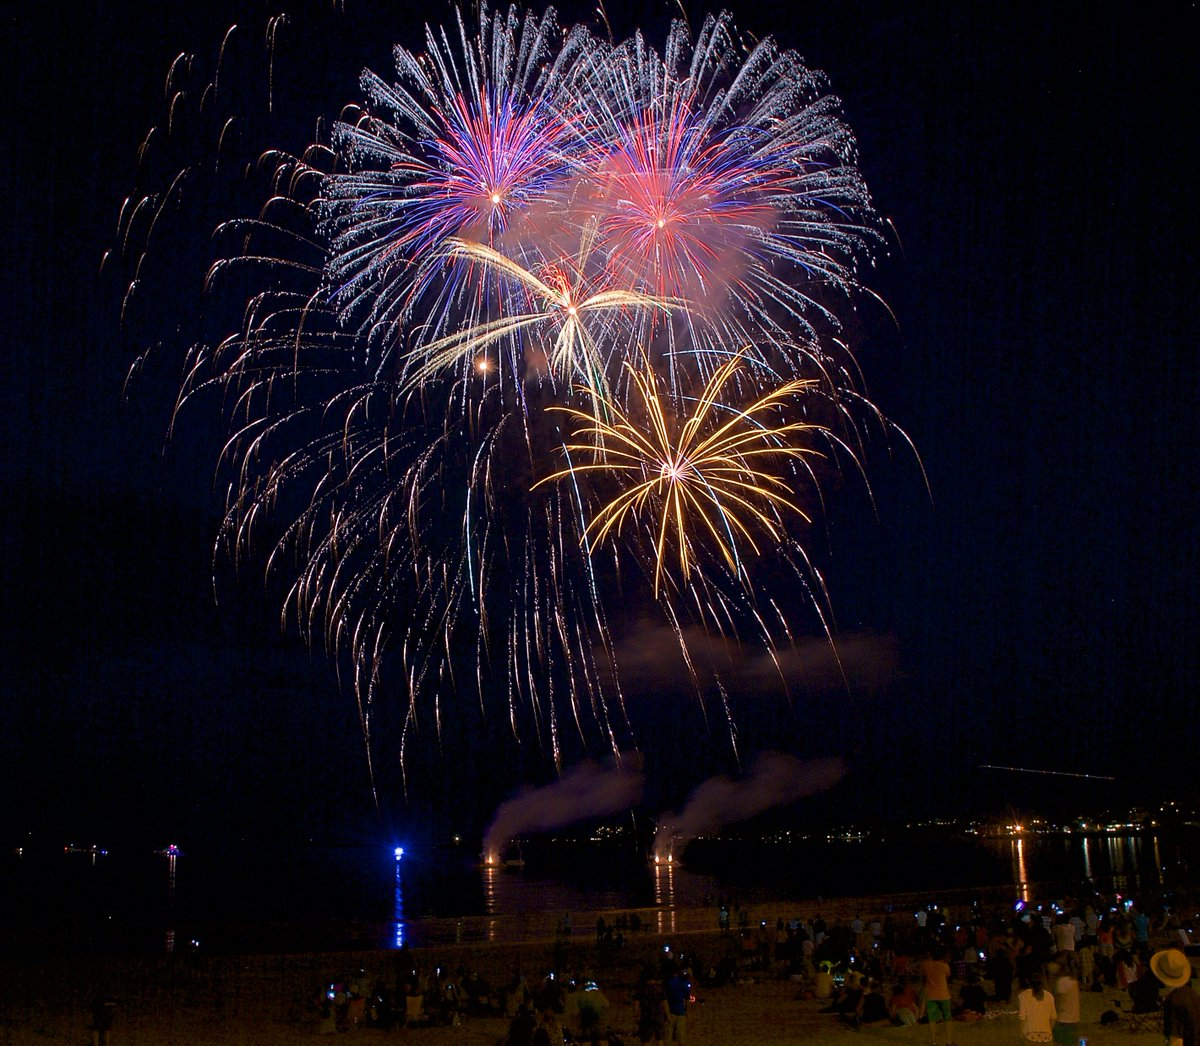 John hamel johnhamel twitter fireworksextravaganza at the 2016 reverebeach international sand sculpting festivalpicitterxq6oyf91c0 nvjuhfo Choice Image